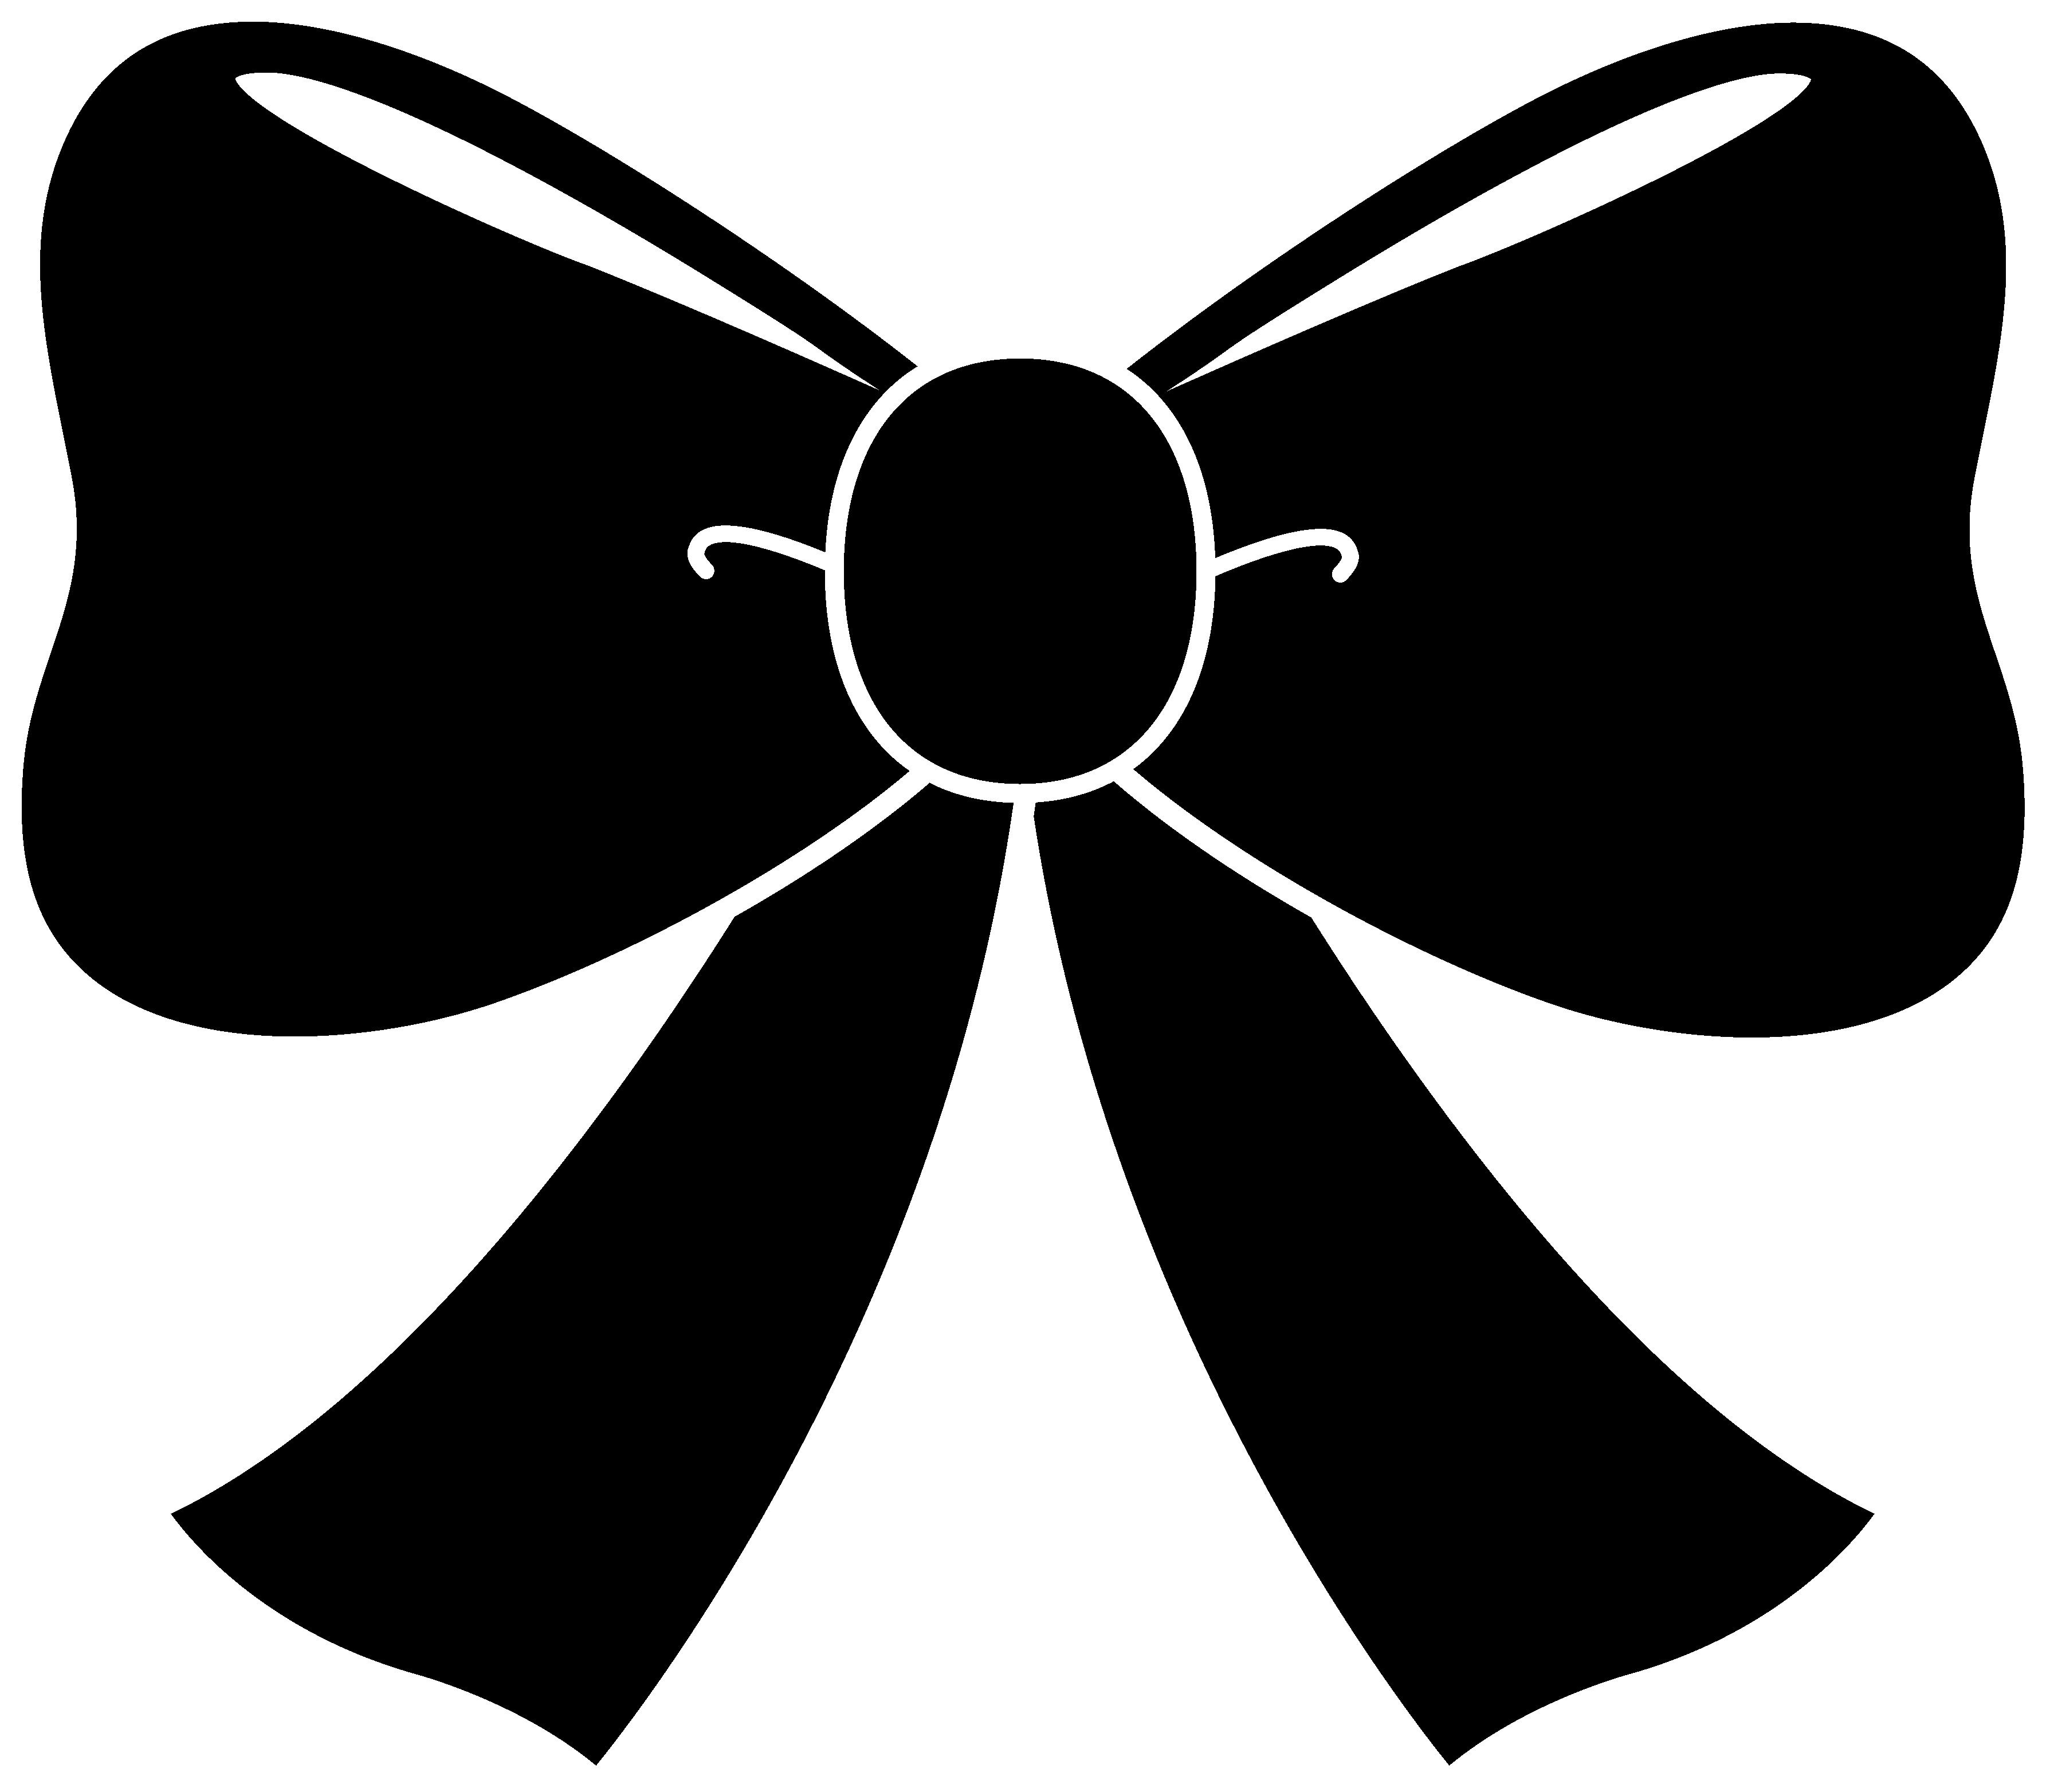 Cute Black Bow Clipart-Cute Black Bow Clipart-11